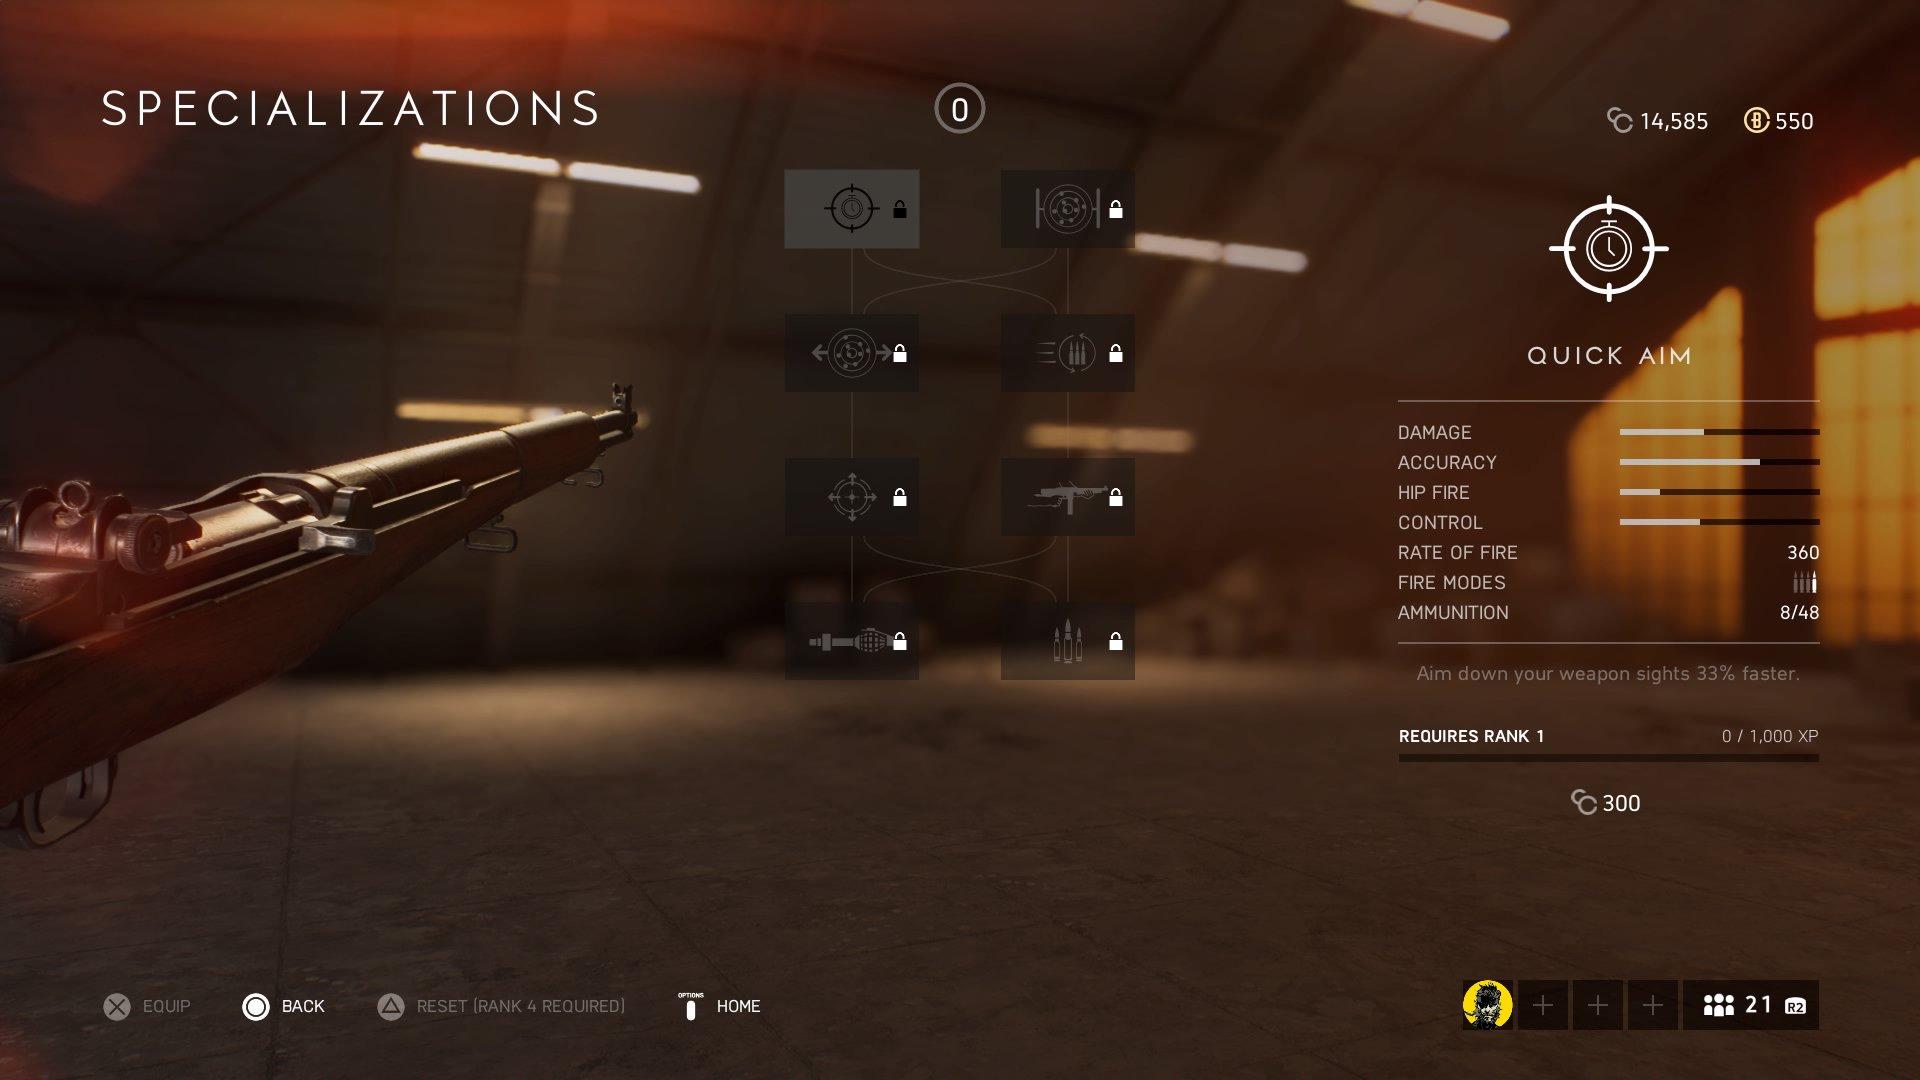 Specializations (Battlefield V)